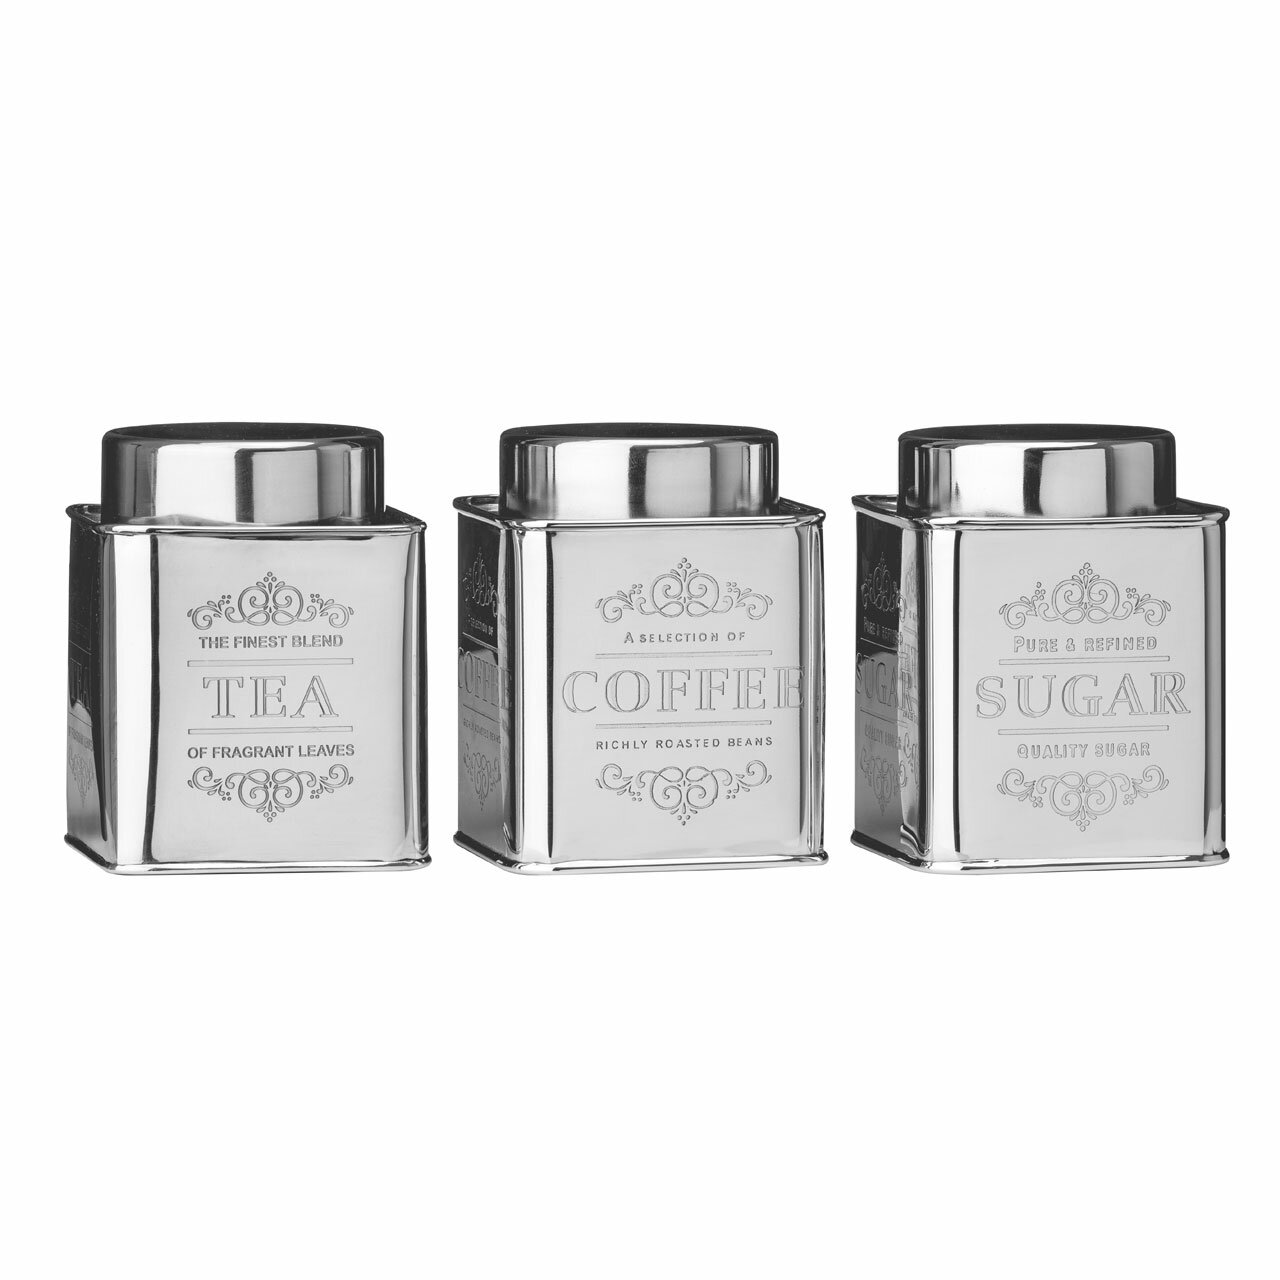 Castleton Home Chai 3 Piece Tea Coffee Sugar Stainless Steel Canister Set Reviews Wayfair Co Uk